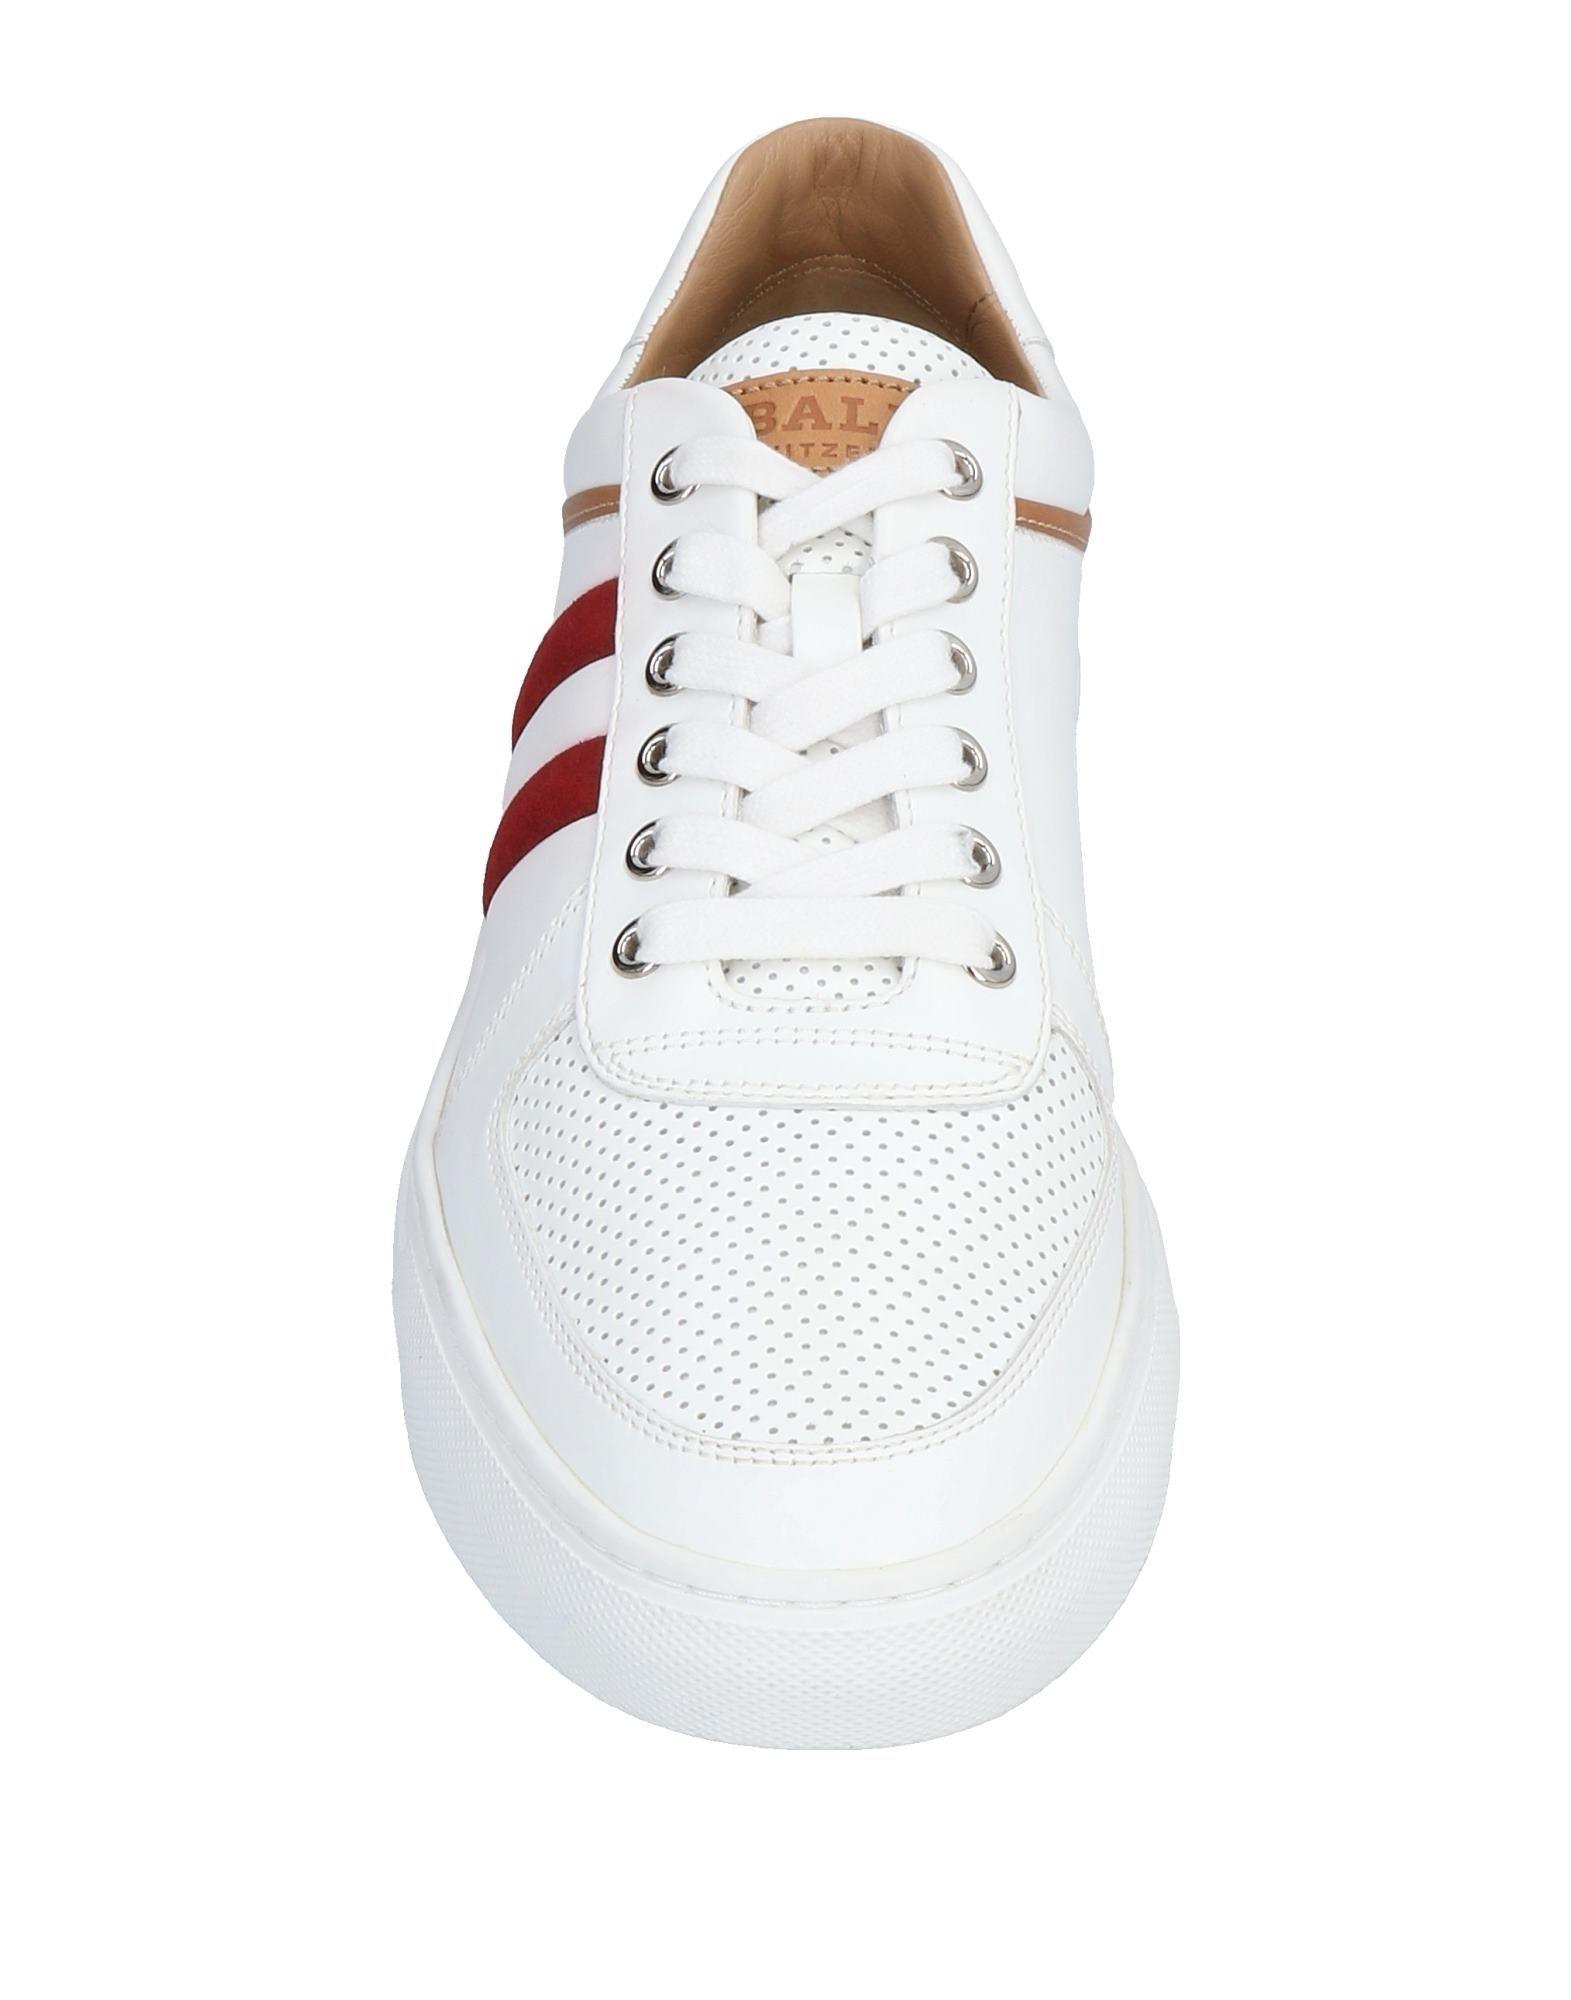 Bally Sneakers Herren  11475252QI Schuhe Gute Qualität beliebte Schuhe 11475252QI 3aa1e4